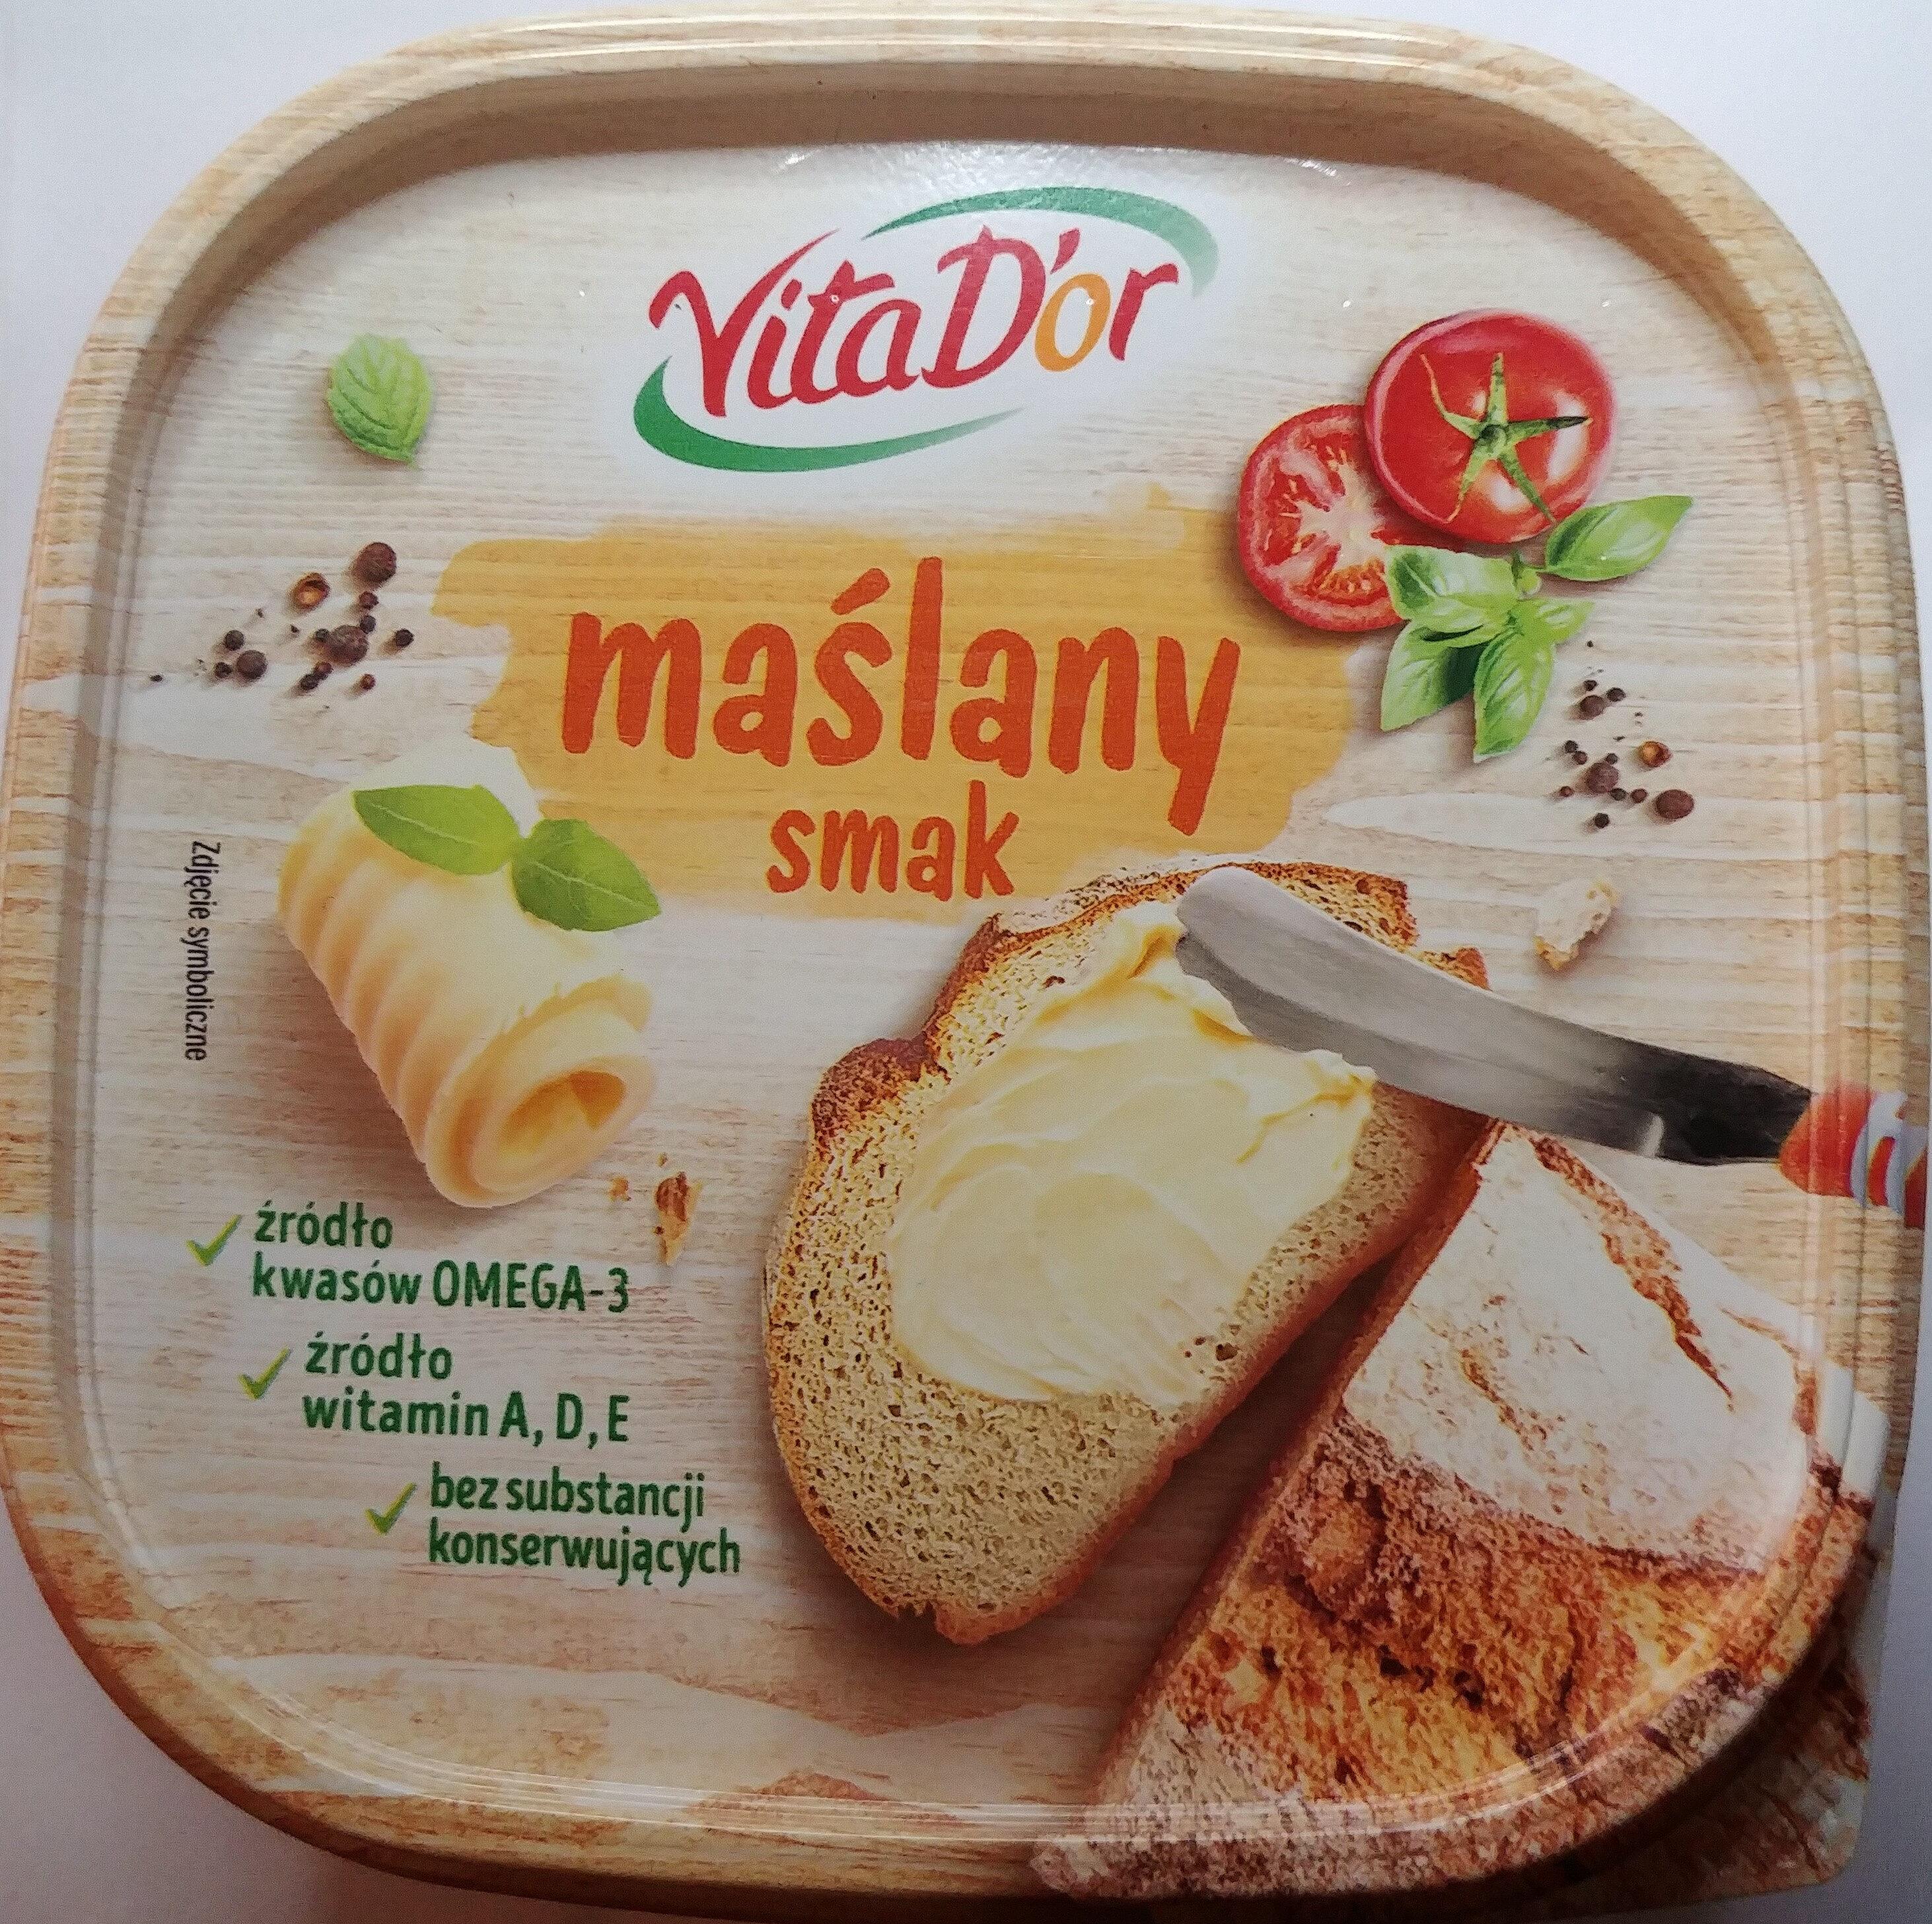 Margaryna lekka 39 %. - Product - pl